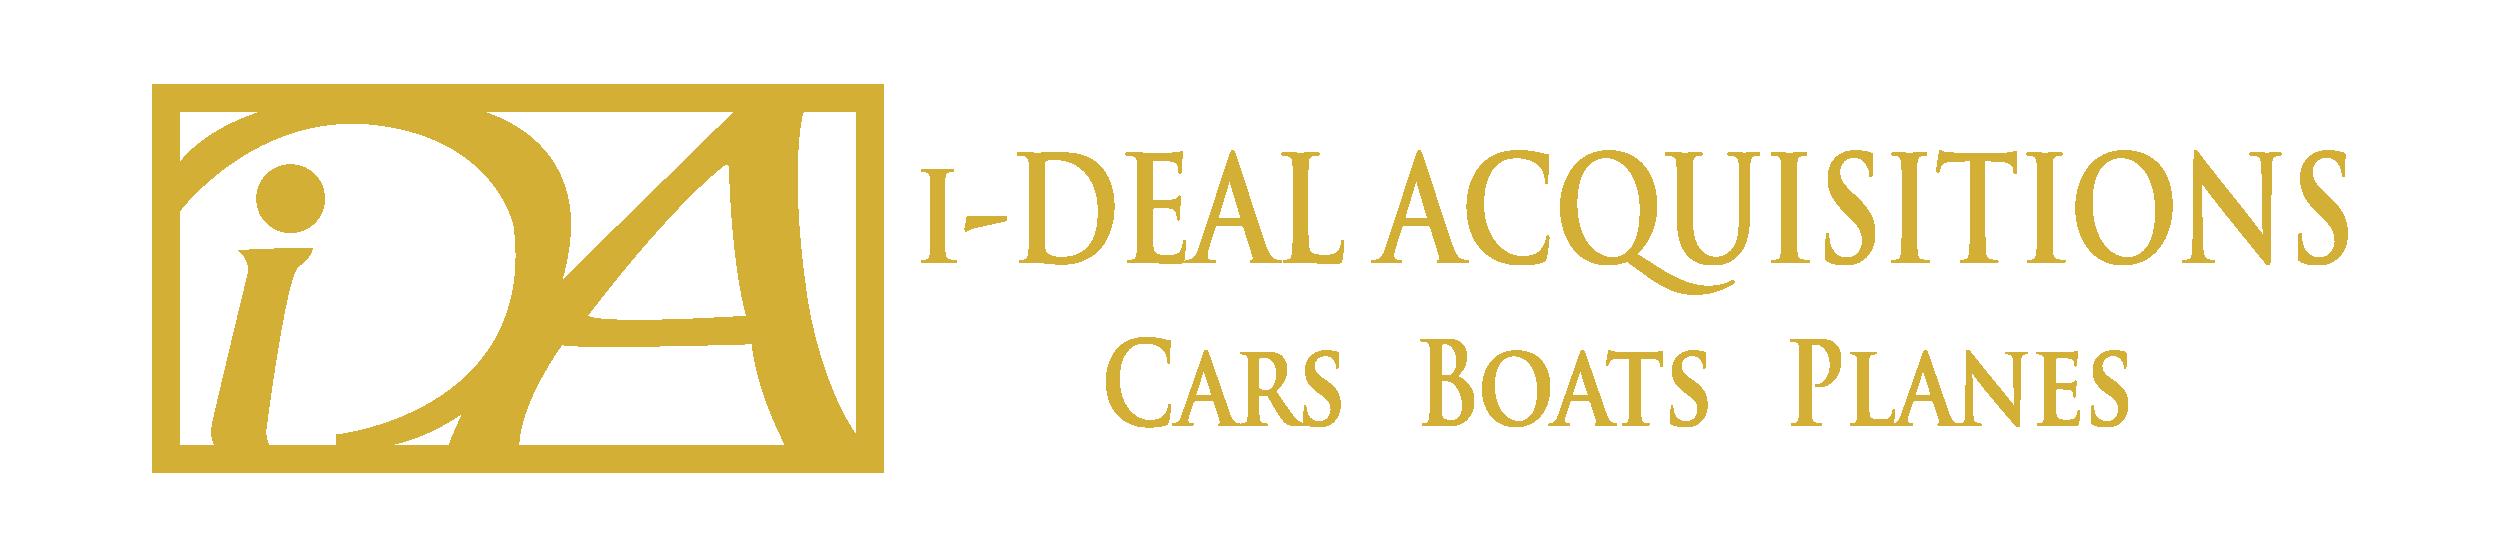 i-Deal Acquisitions logo-01